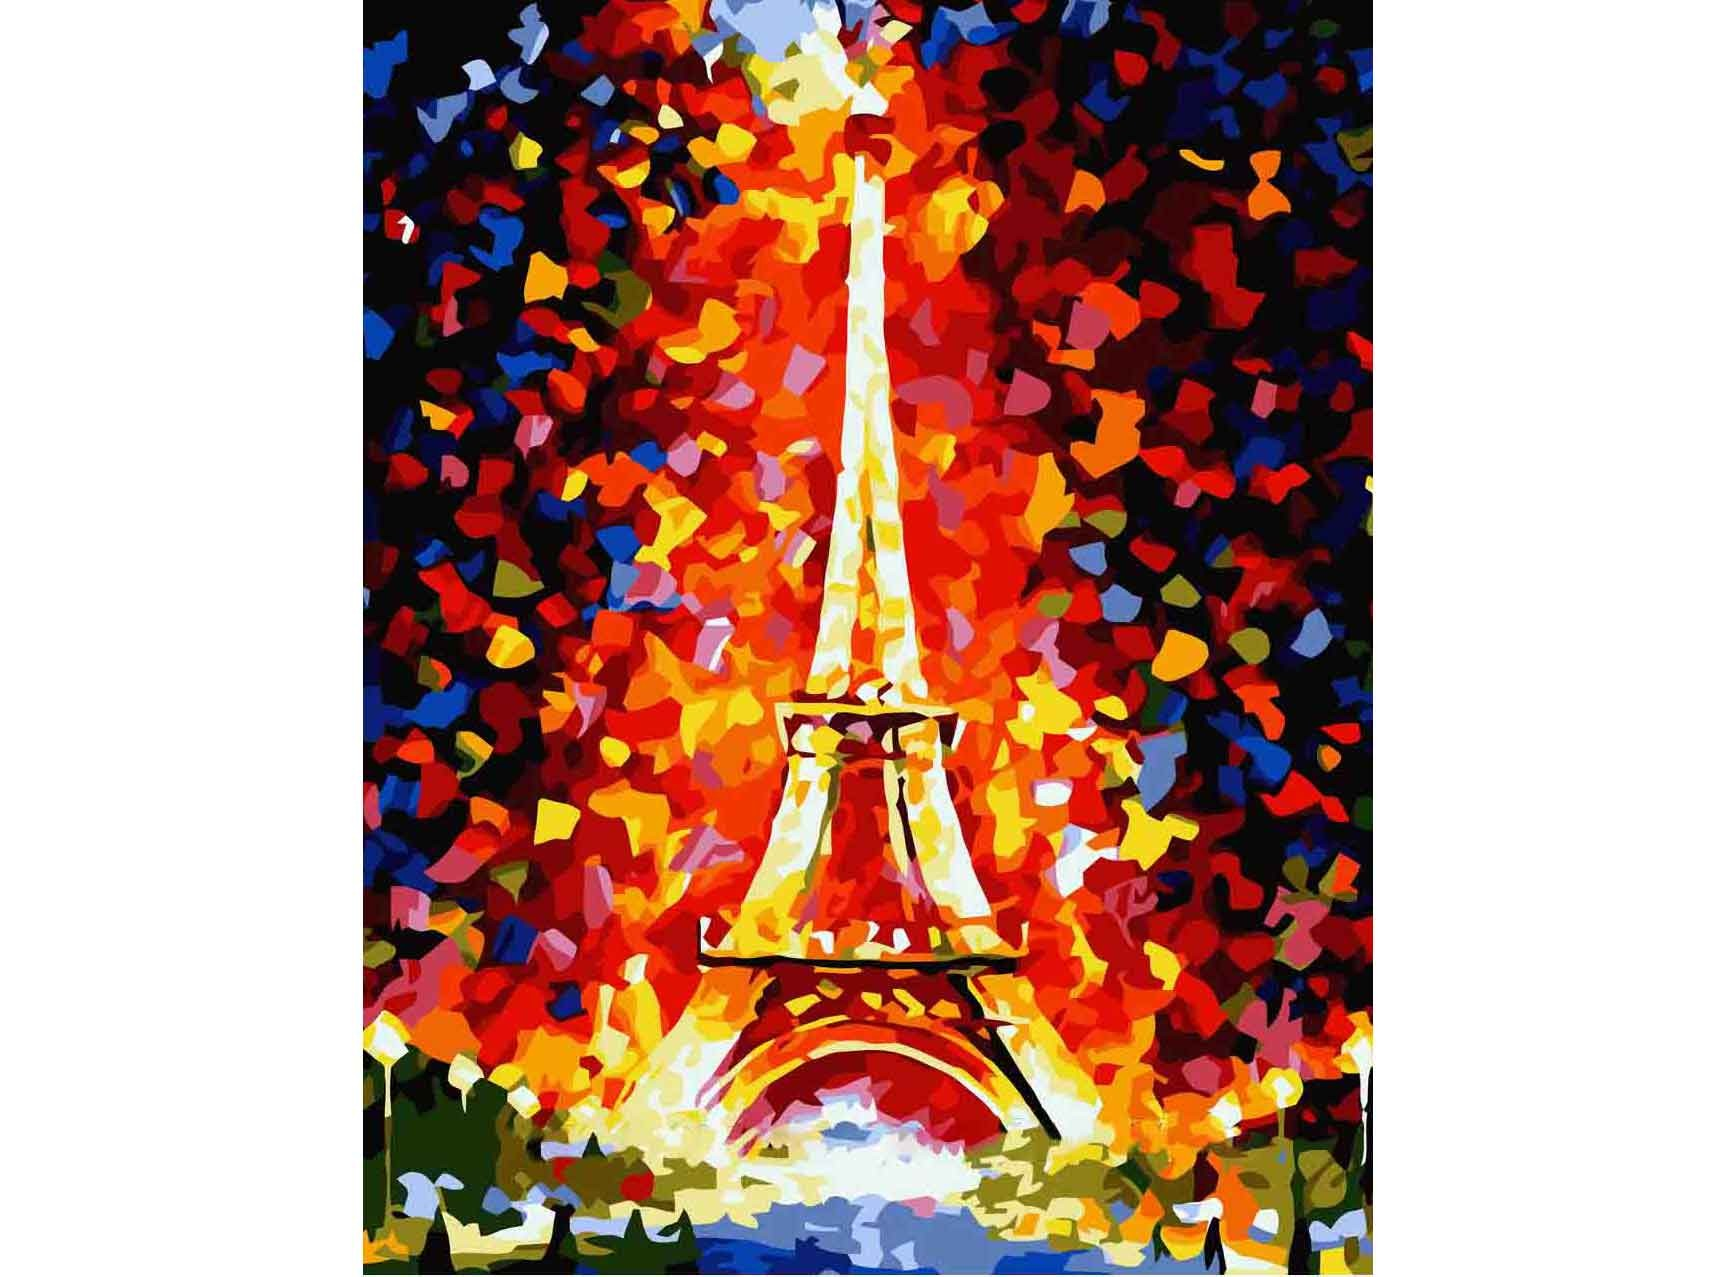 Картины по номерам «Париж - огни Эйфелевой башни»